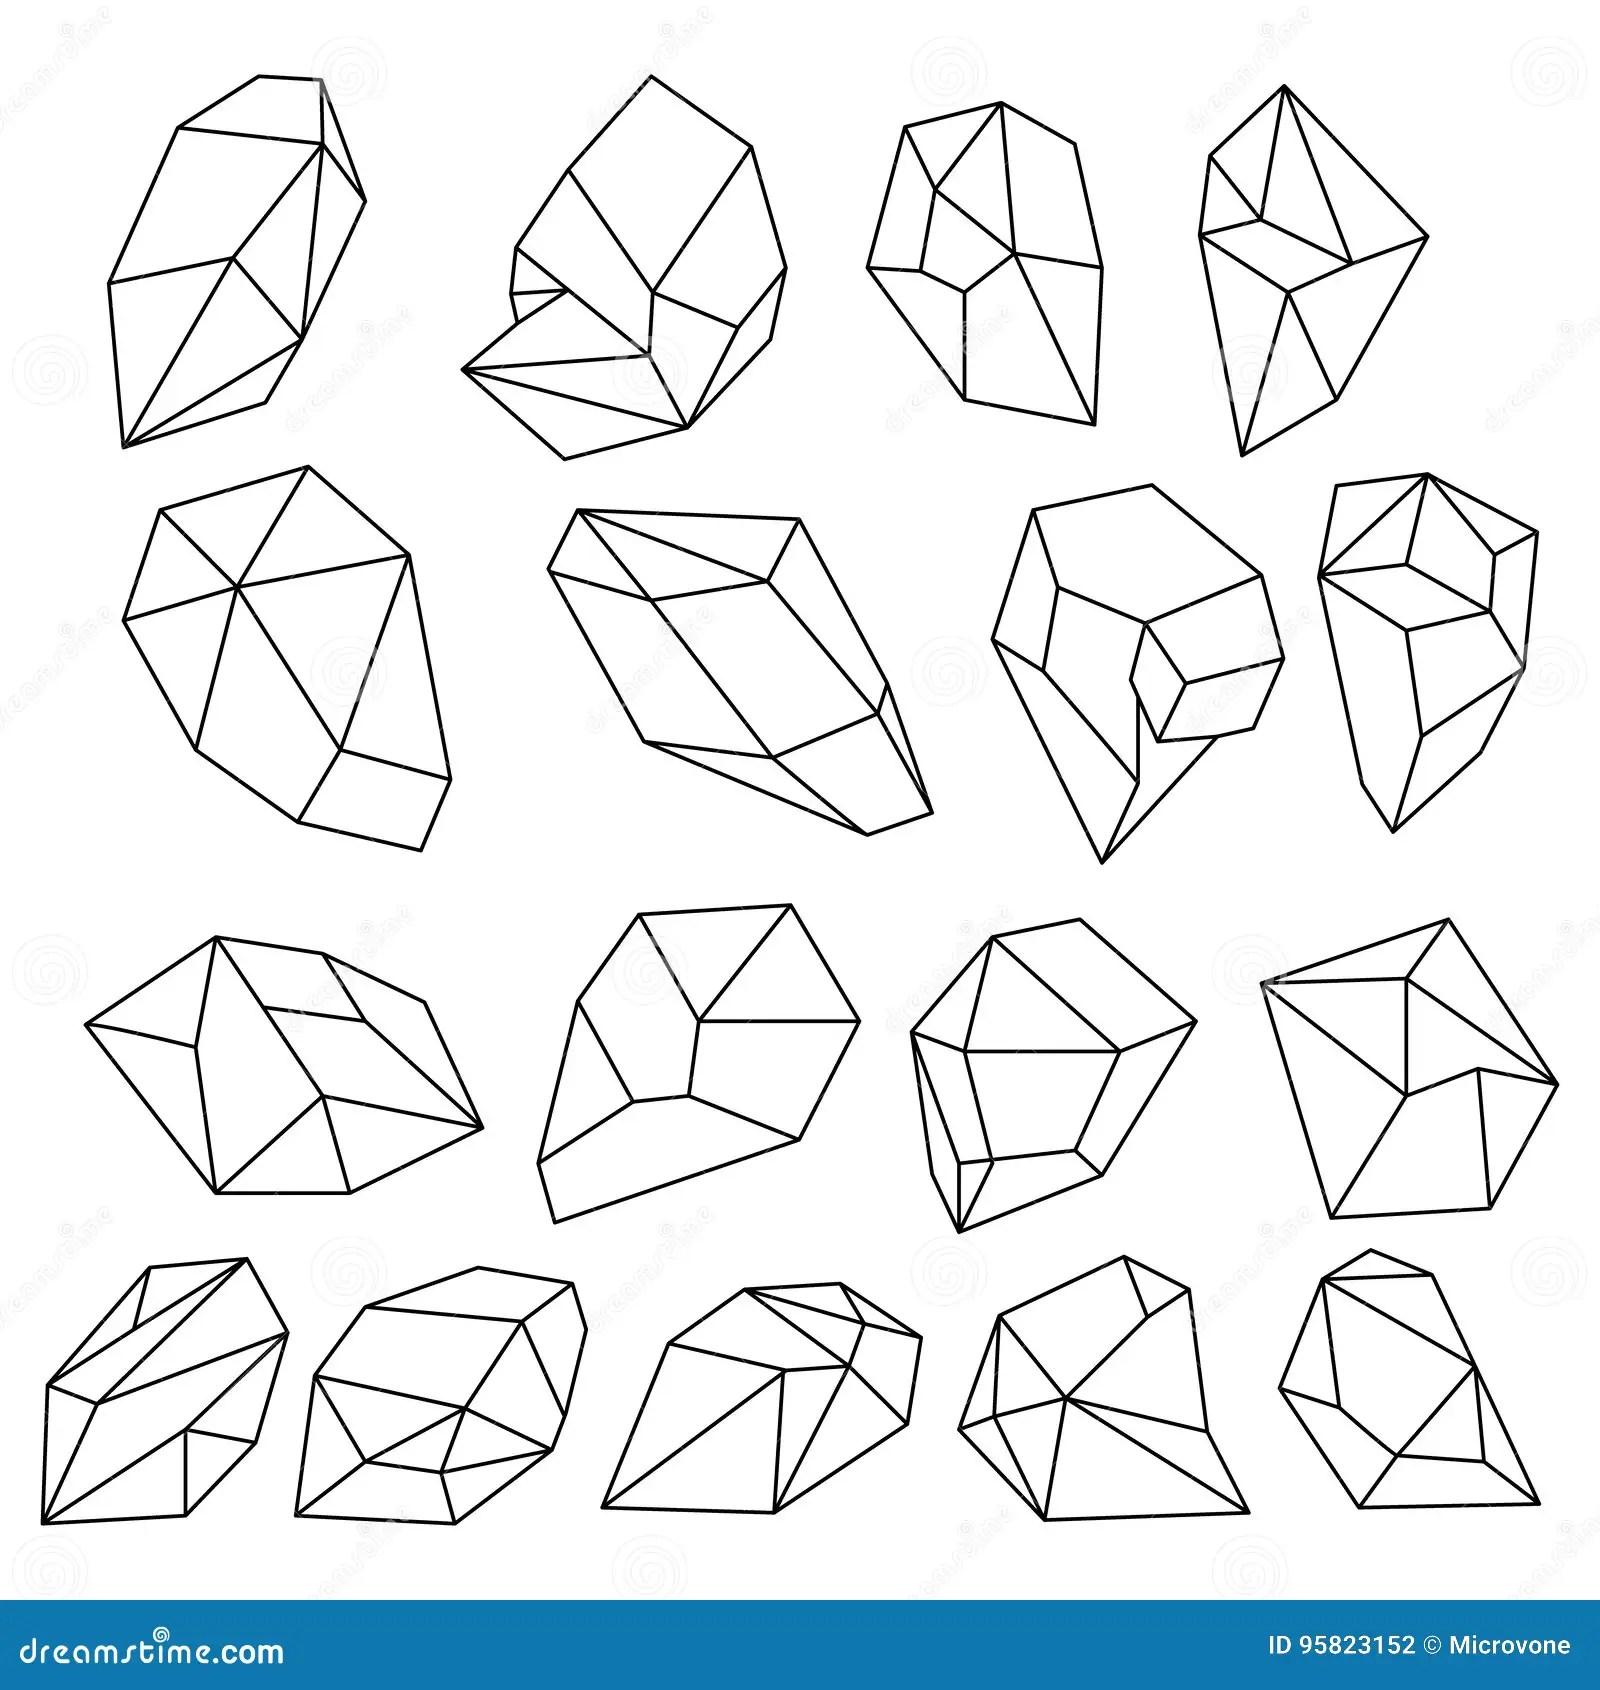 Diamond 3d Shapes Natural Crystals Outline Gem Stones